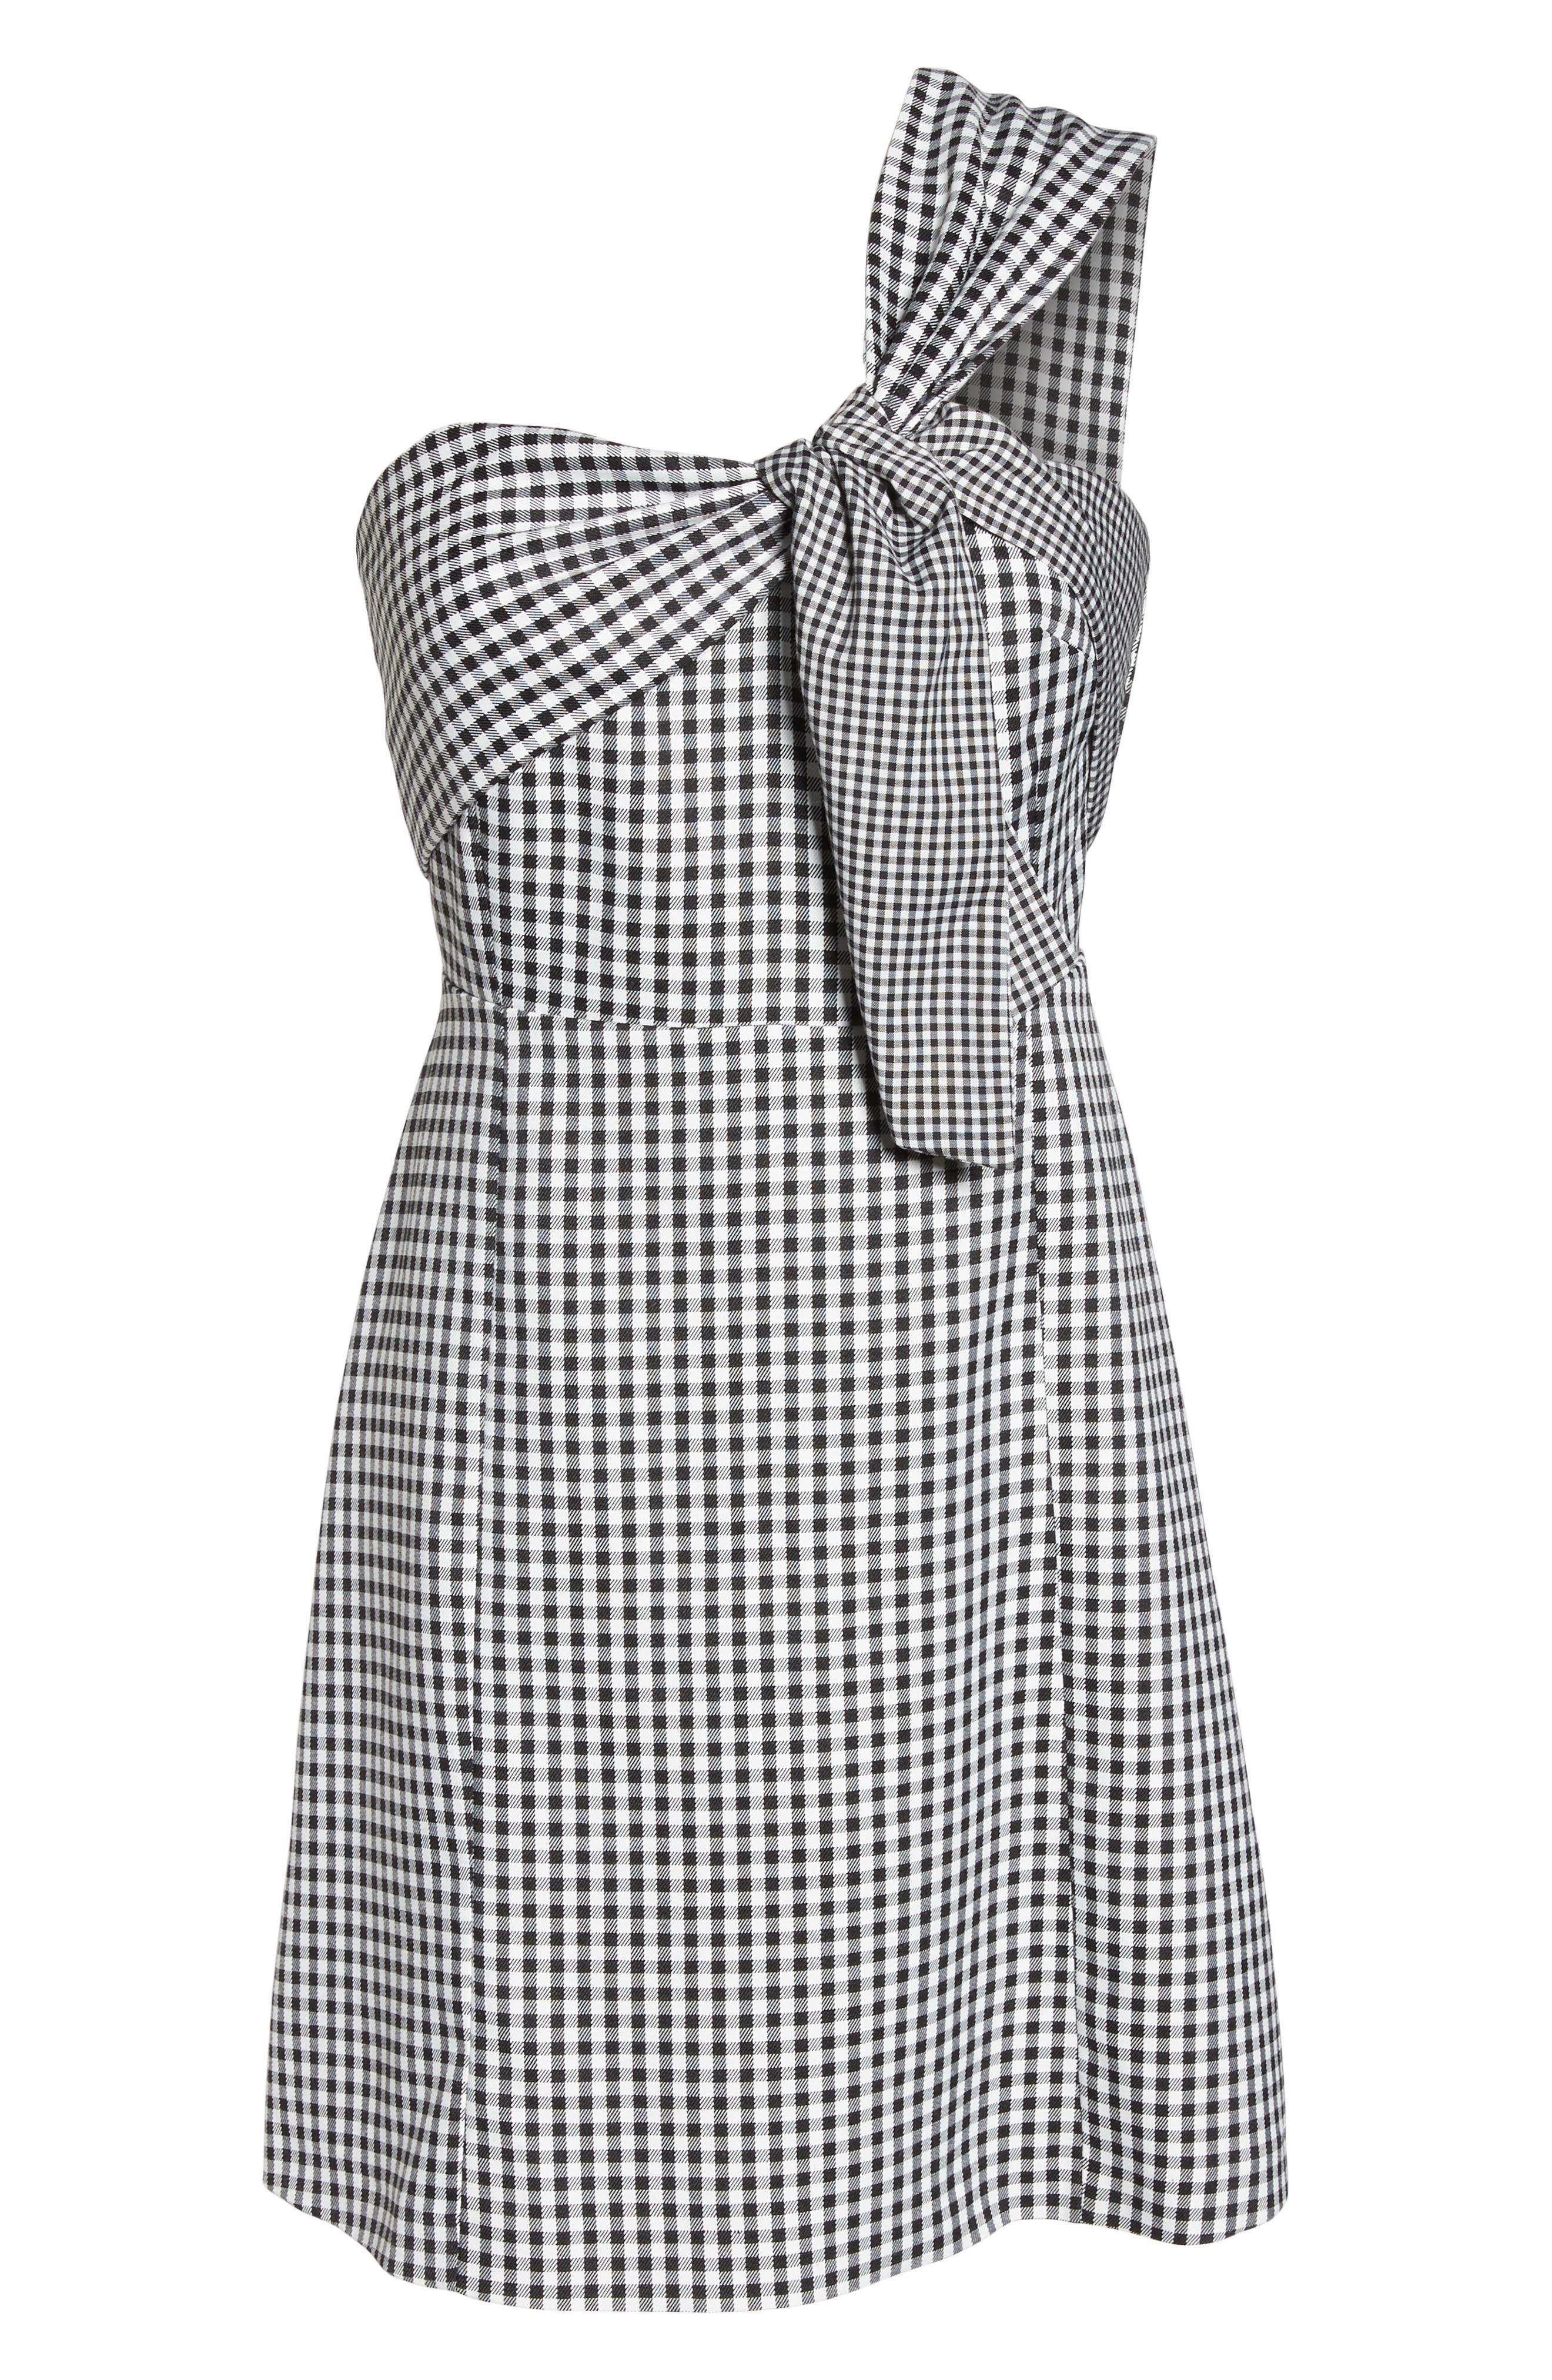 One-Shoulder Gingham Dress,                             Alternate thumbnail 6, color,                             Black/ White